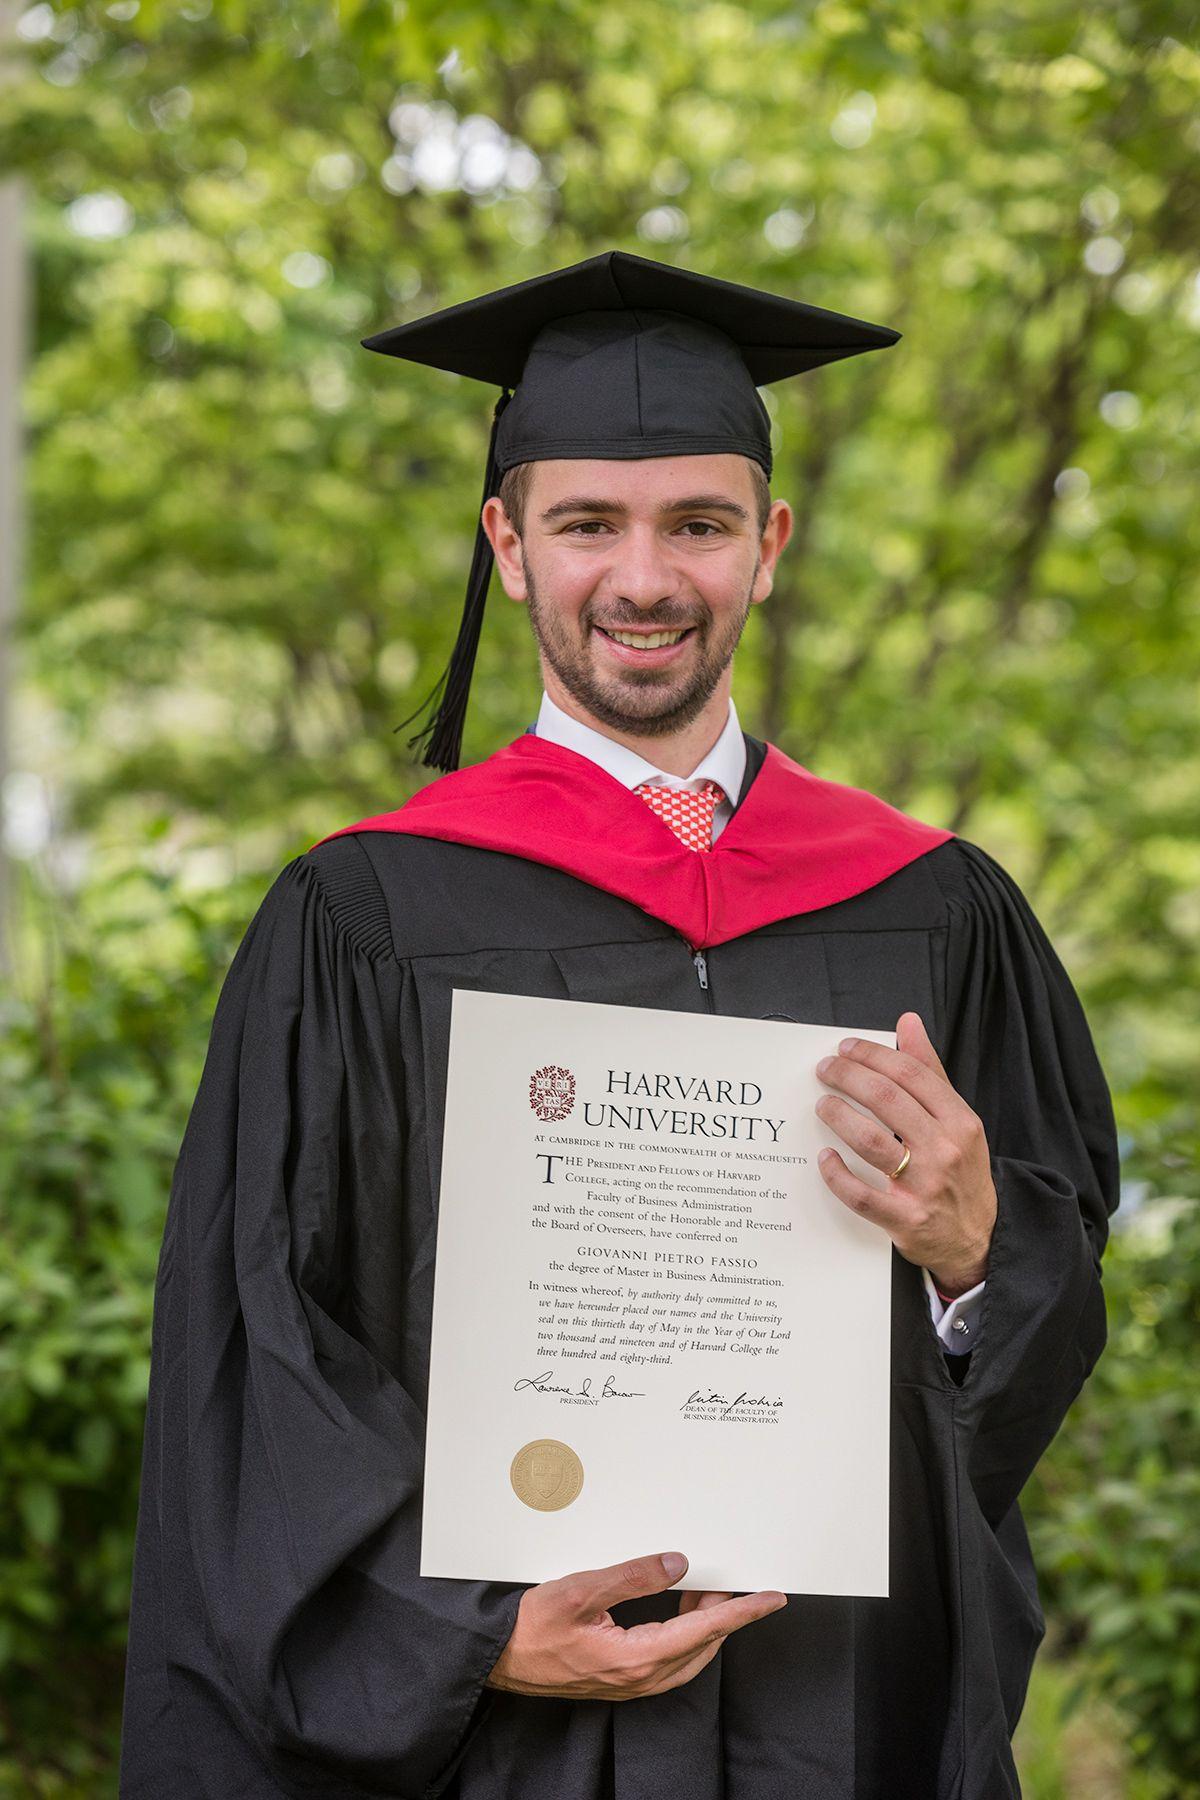 Harvard's Graduation